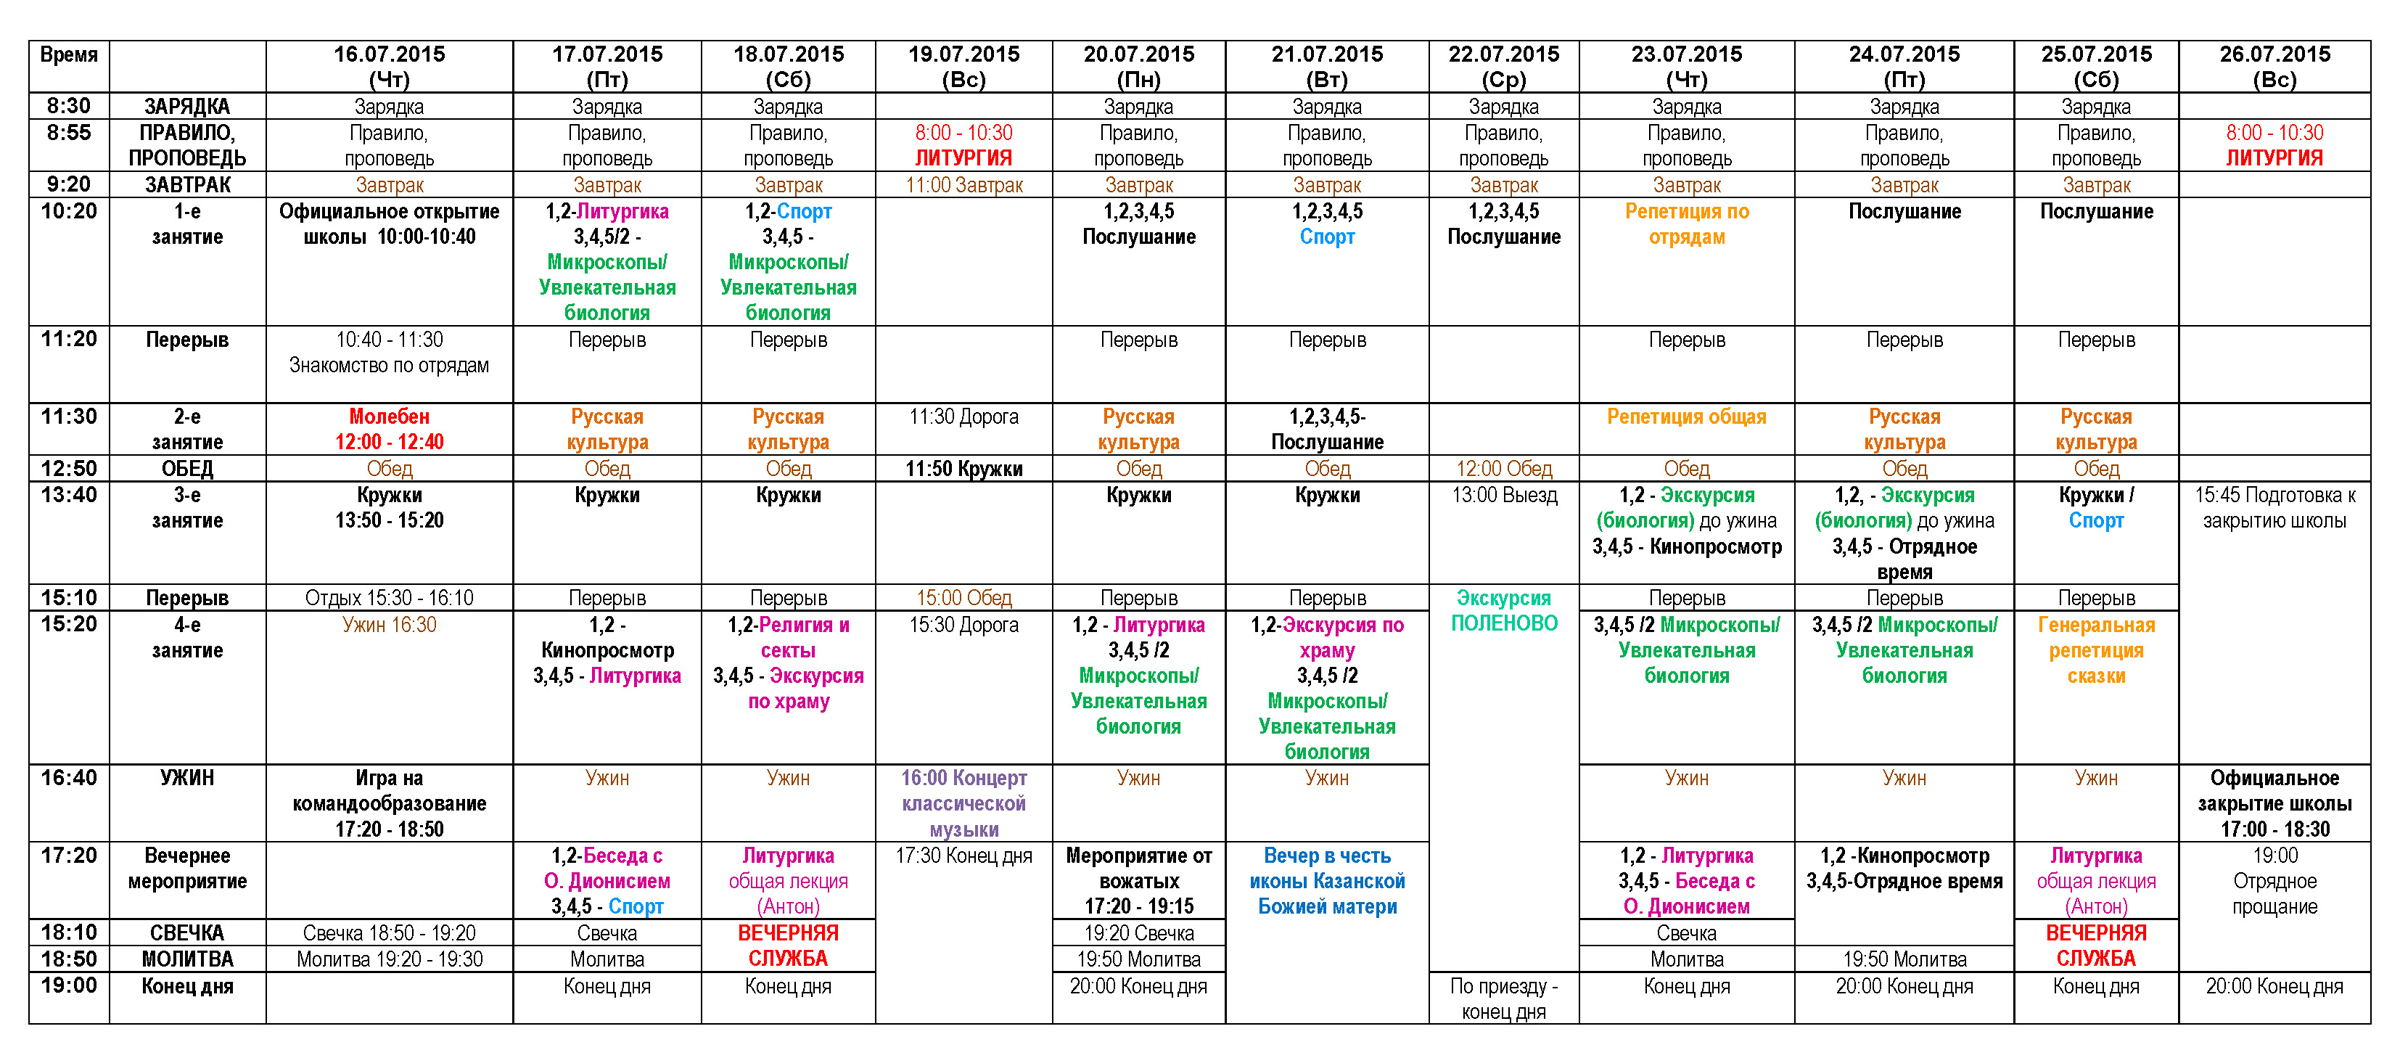 Расписание ЛПШ Вертоград-2015